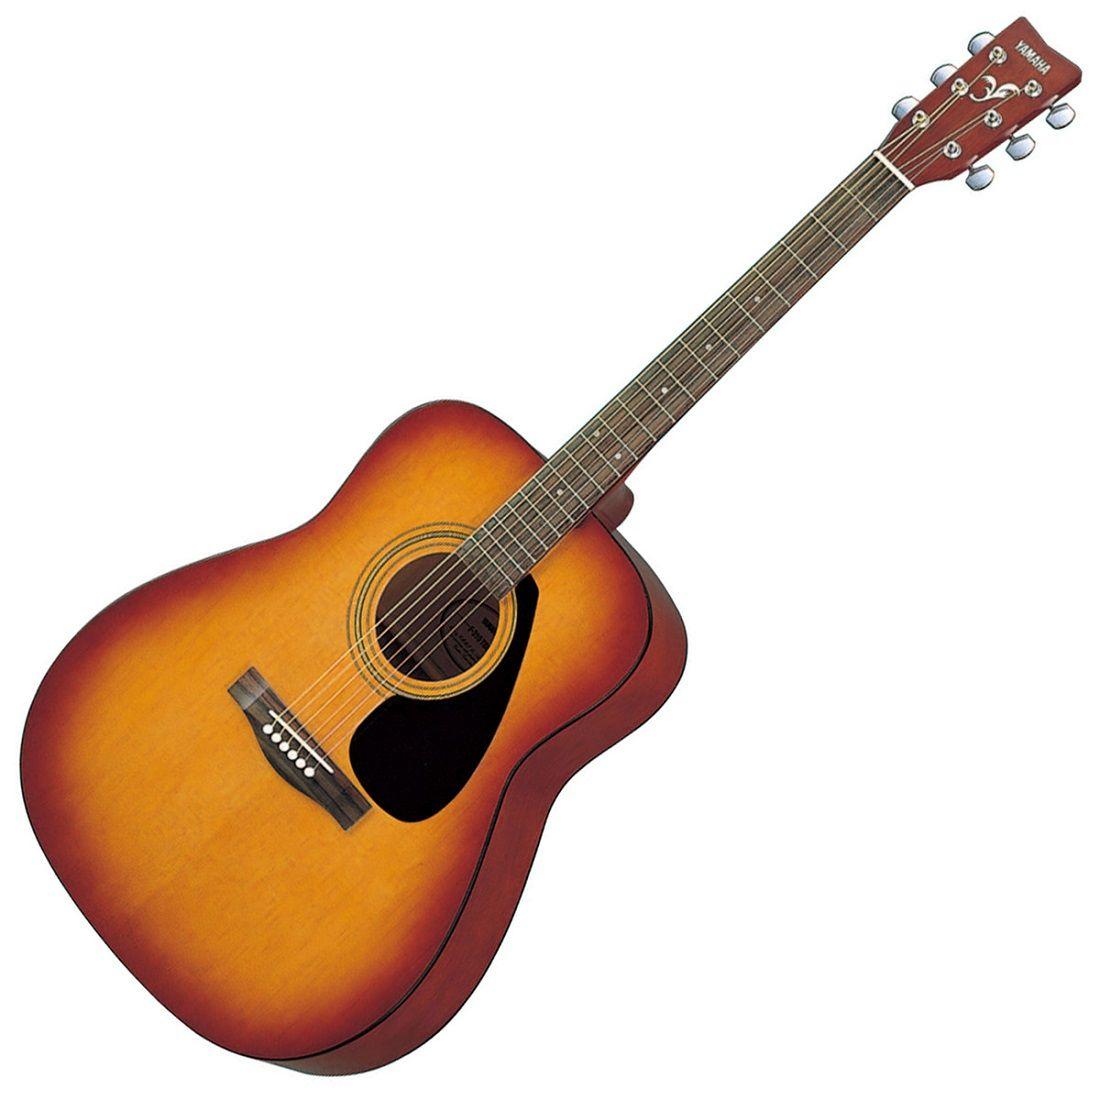 Yamaha F310 Acoustic Guitar Tobacco Sunburst Yamaha Guitar Guitar Tuners Yamaha F310